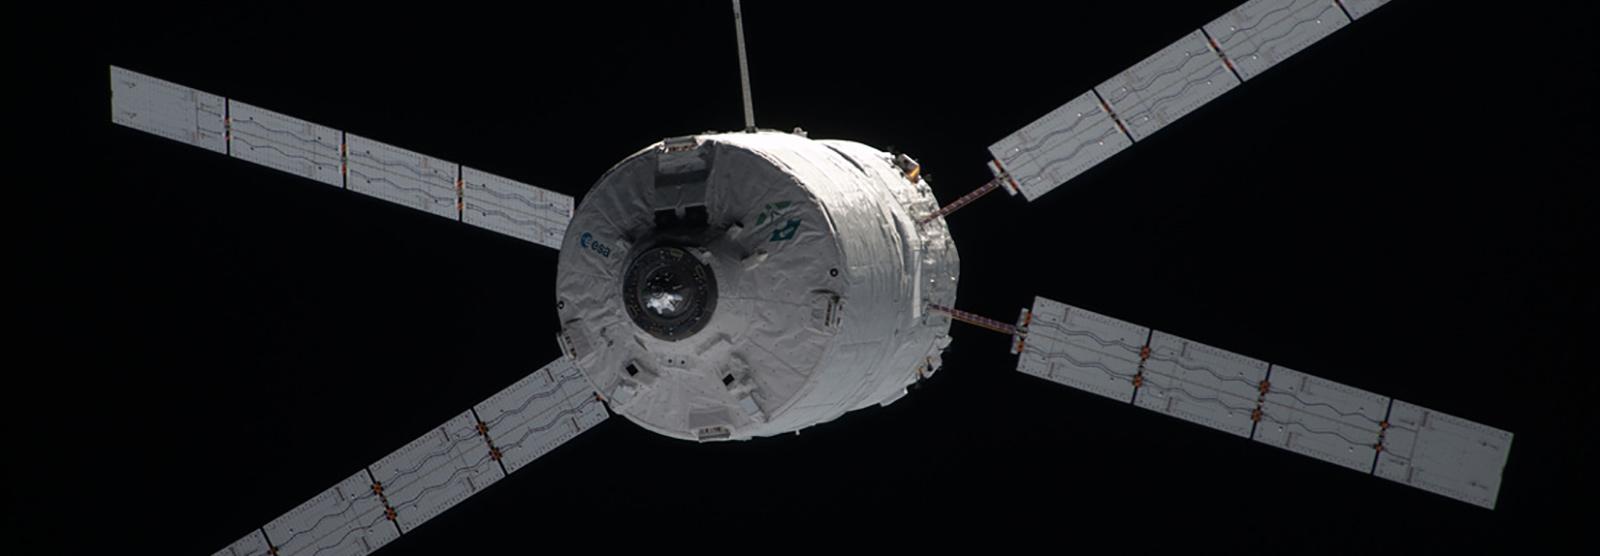 photo satellite programme scientifique